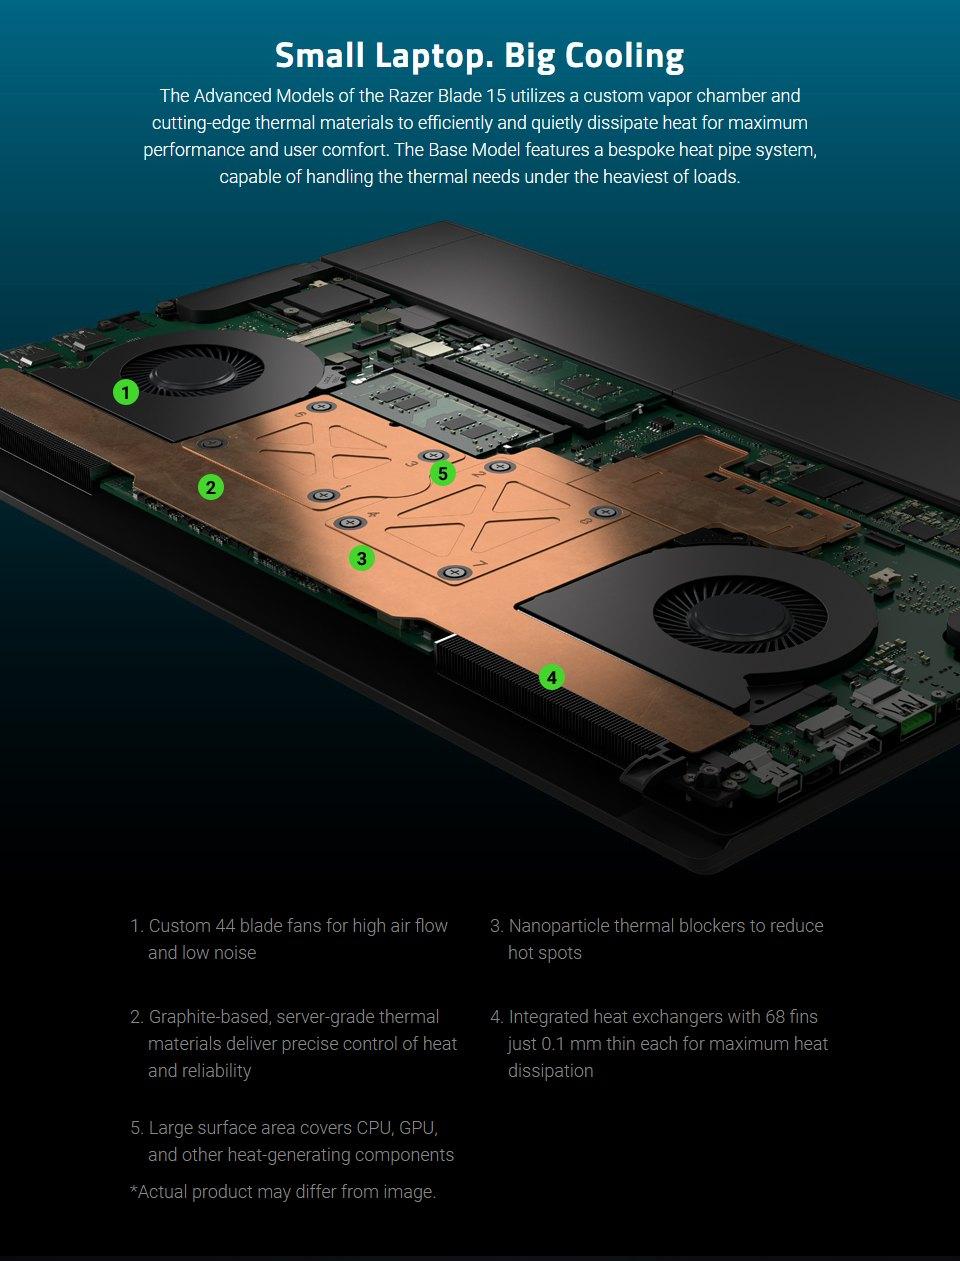 Razer Blade Core i7 RTX 2070 15.6in 240hz Notebook [03137E02] features 4